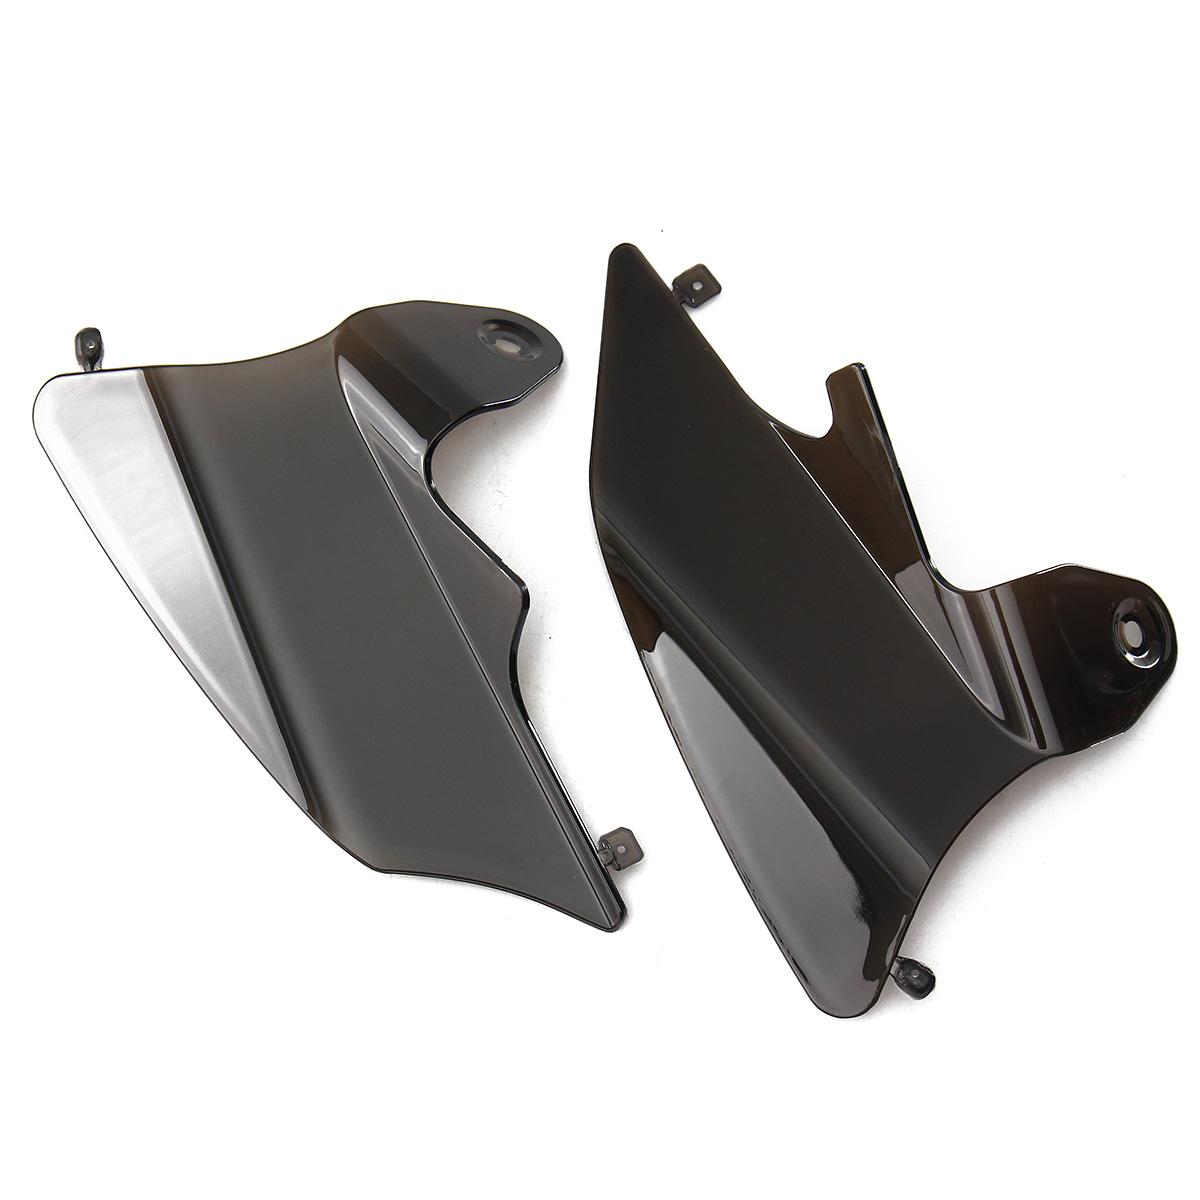 Reflective Saddle Shield Air Heat Deflector For 1997-2007 Harley FLHT FLTR Smoke